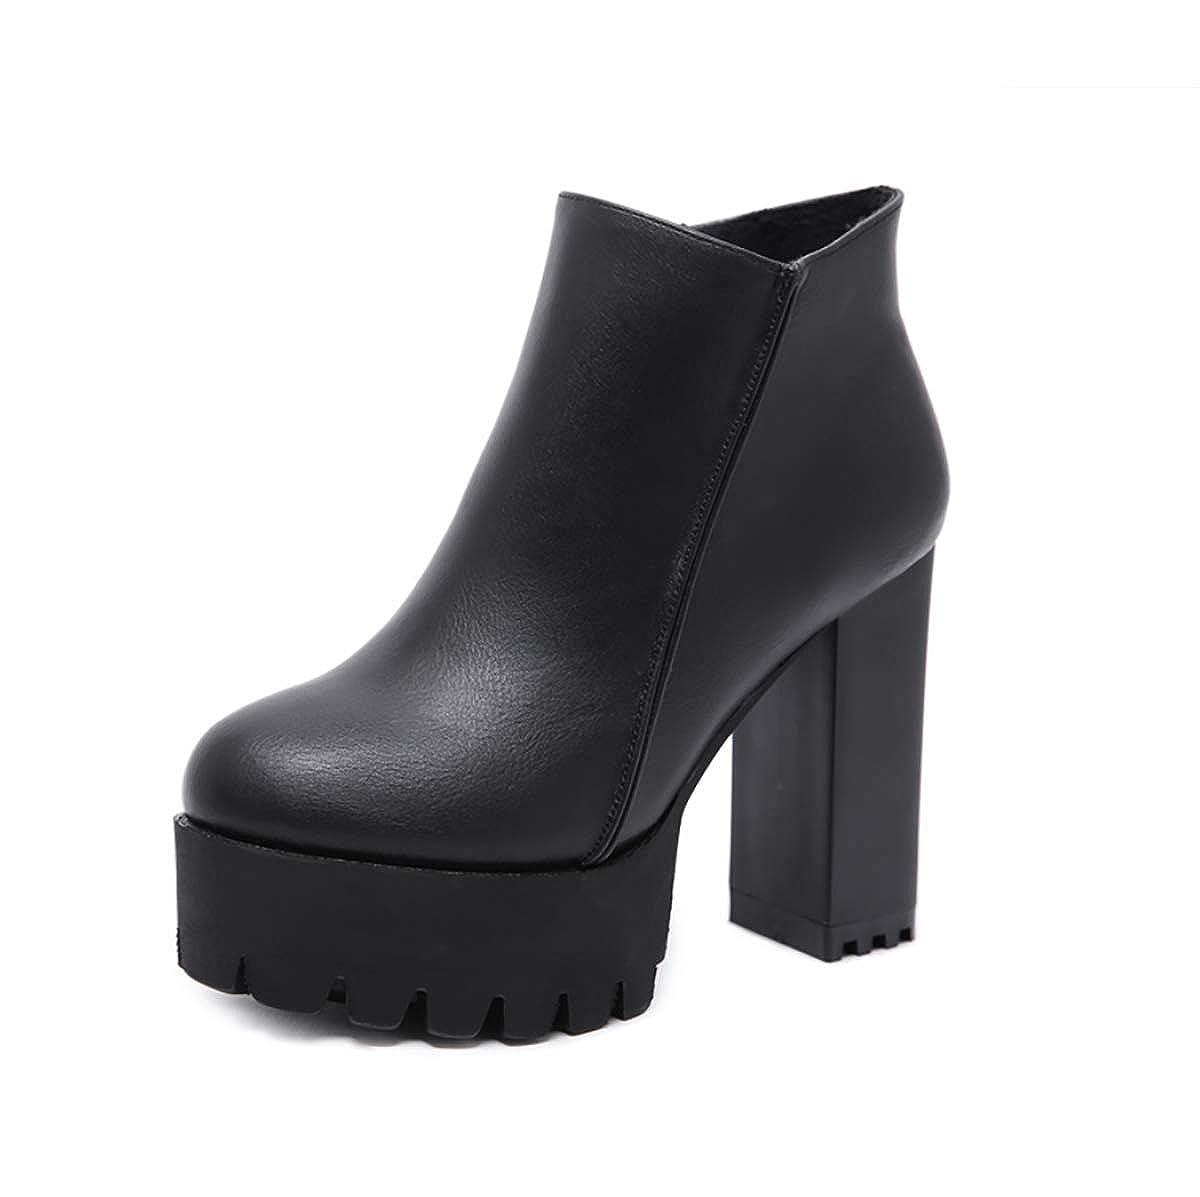 KOKQSX-Damen Plateau Sandalen peep Toe Pumps Toe Plateau stilettoladies'Stiefel Dicke Schuhe Martin Stiefel